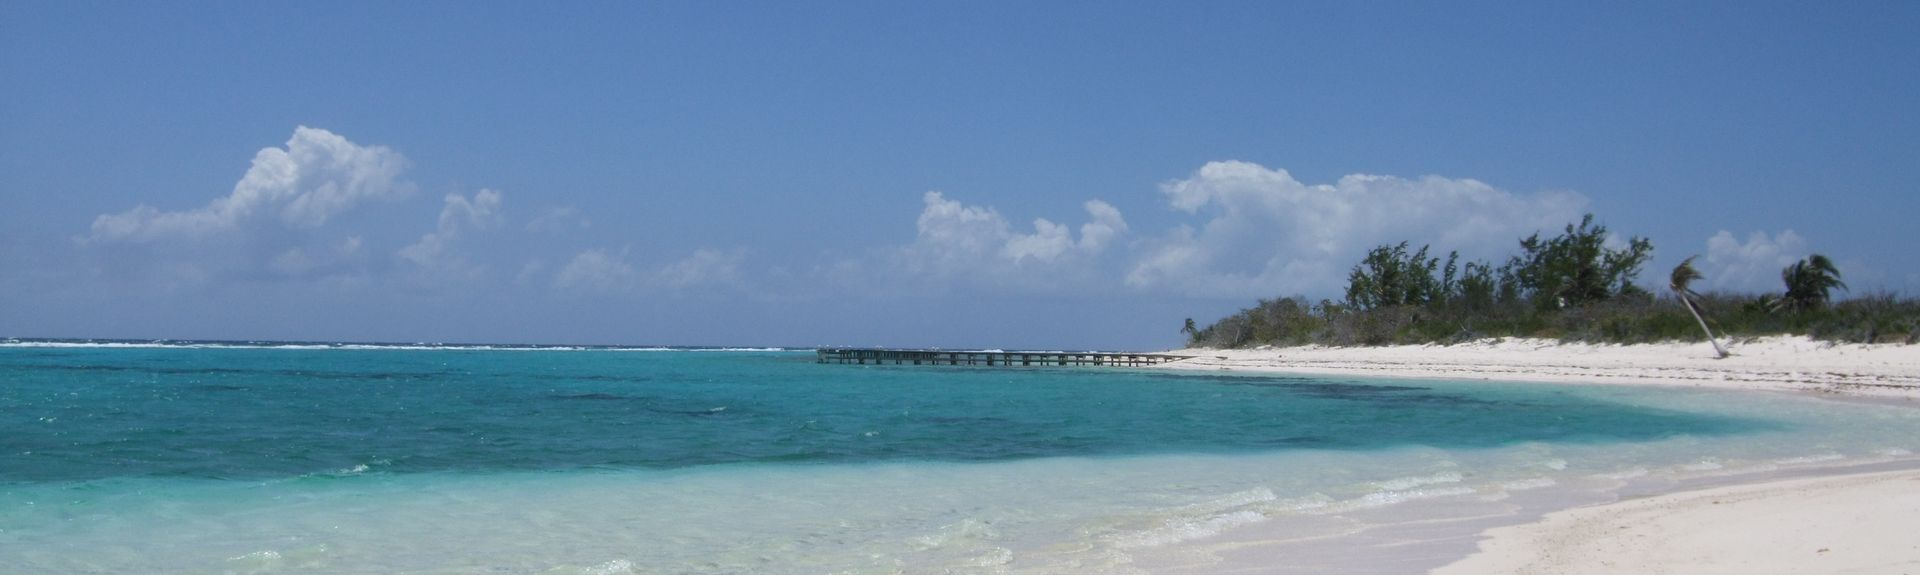 Blossom Village, Ilhas Cayman